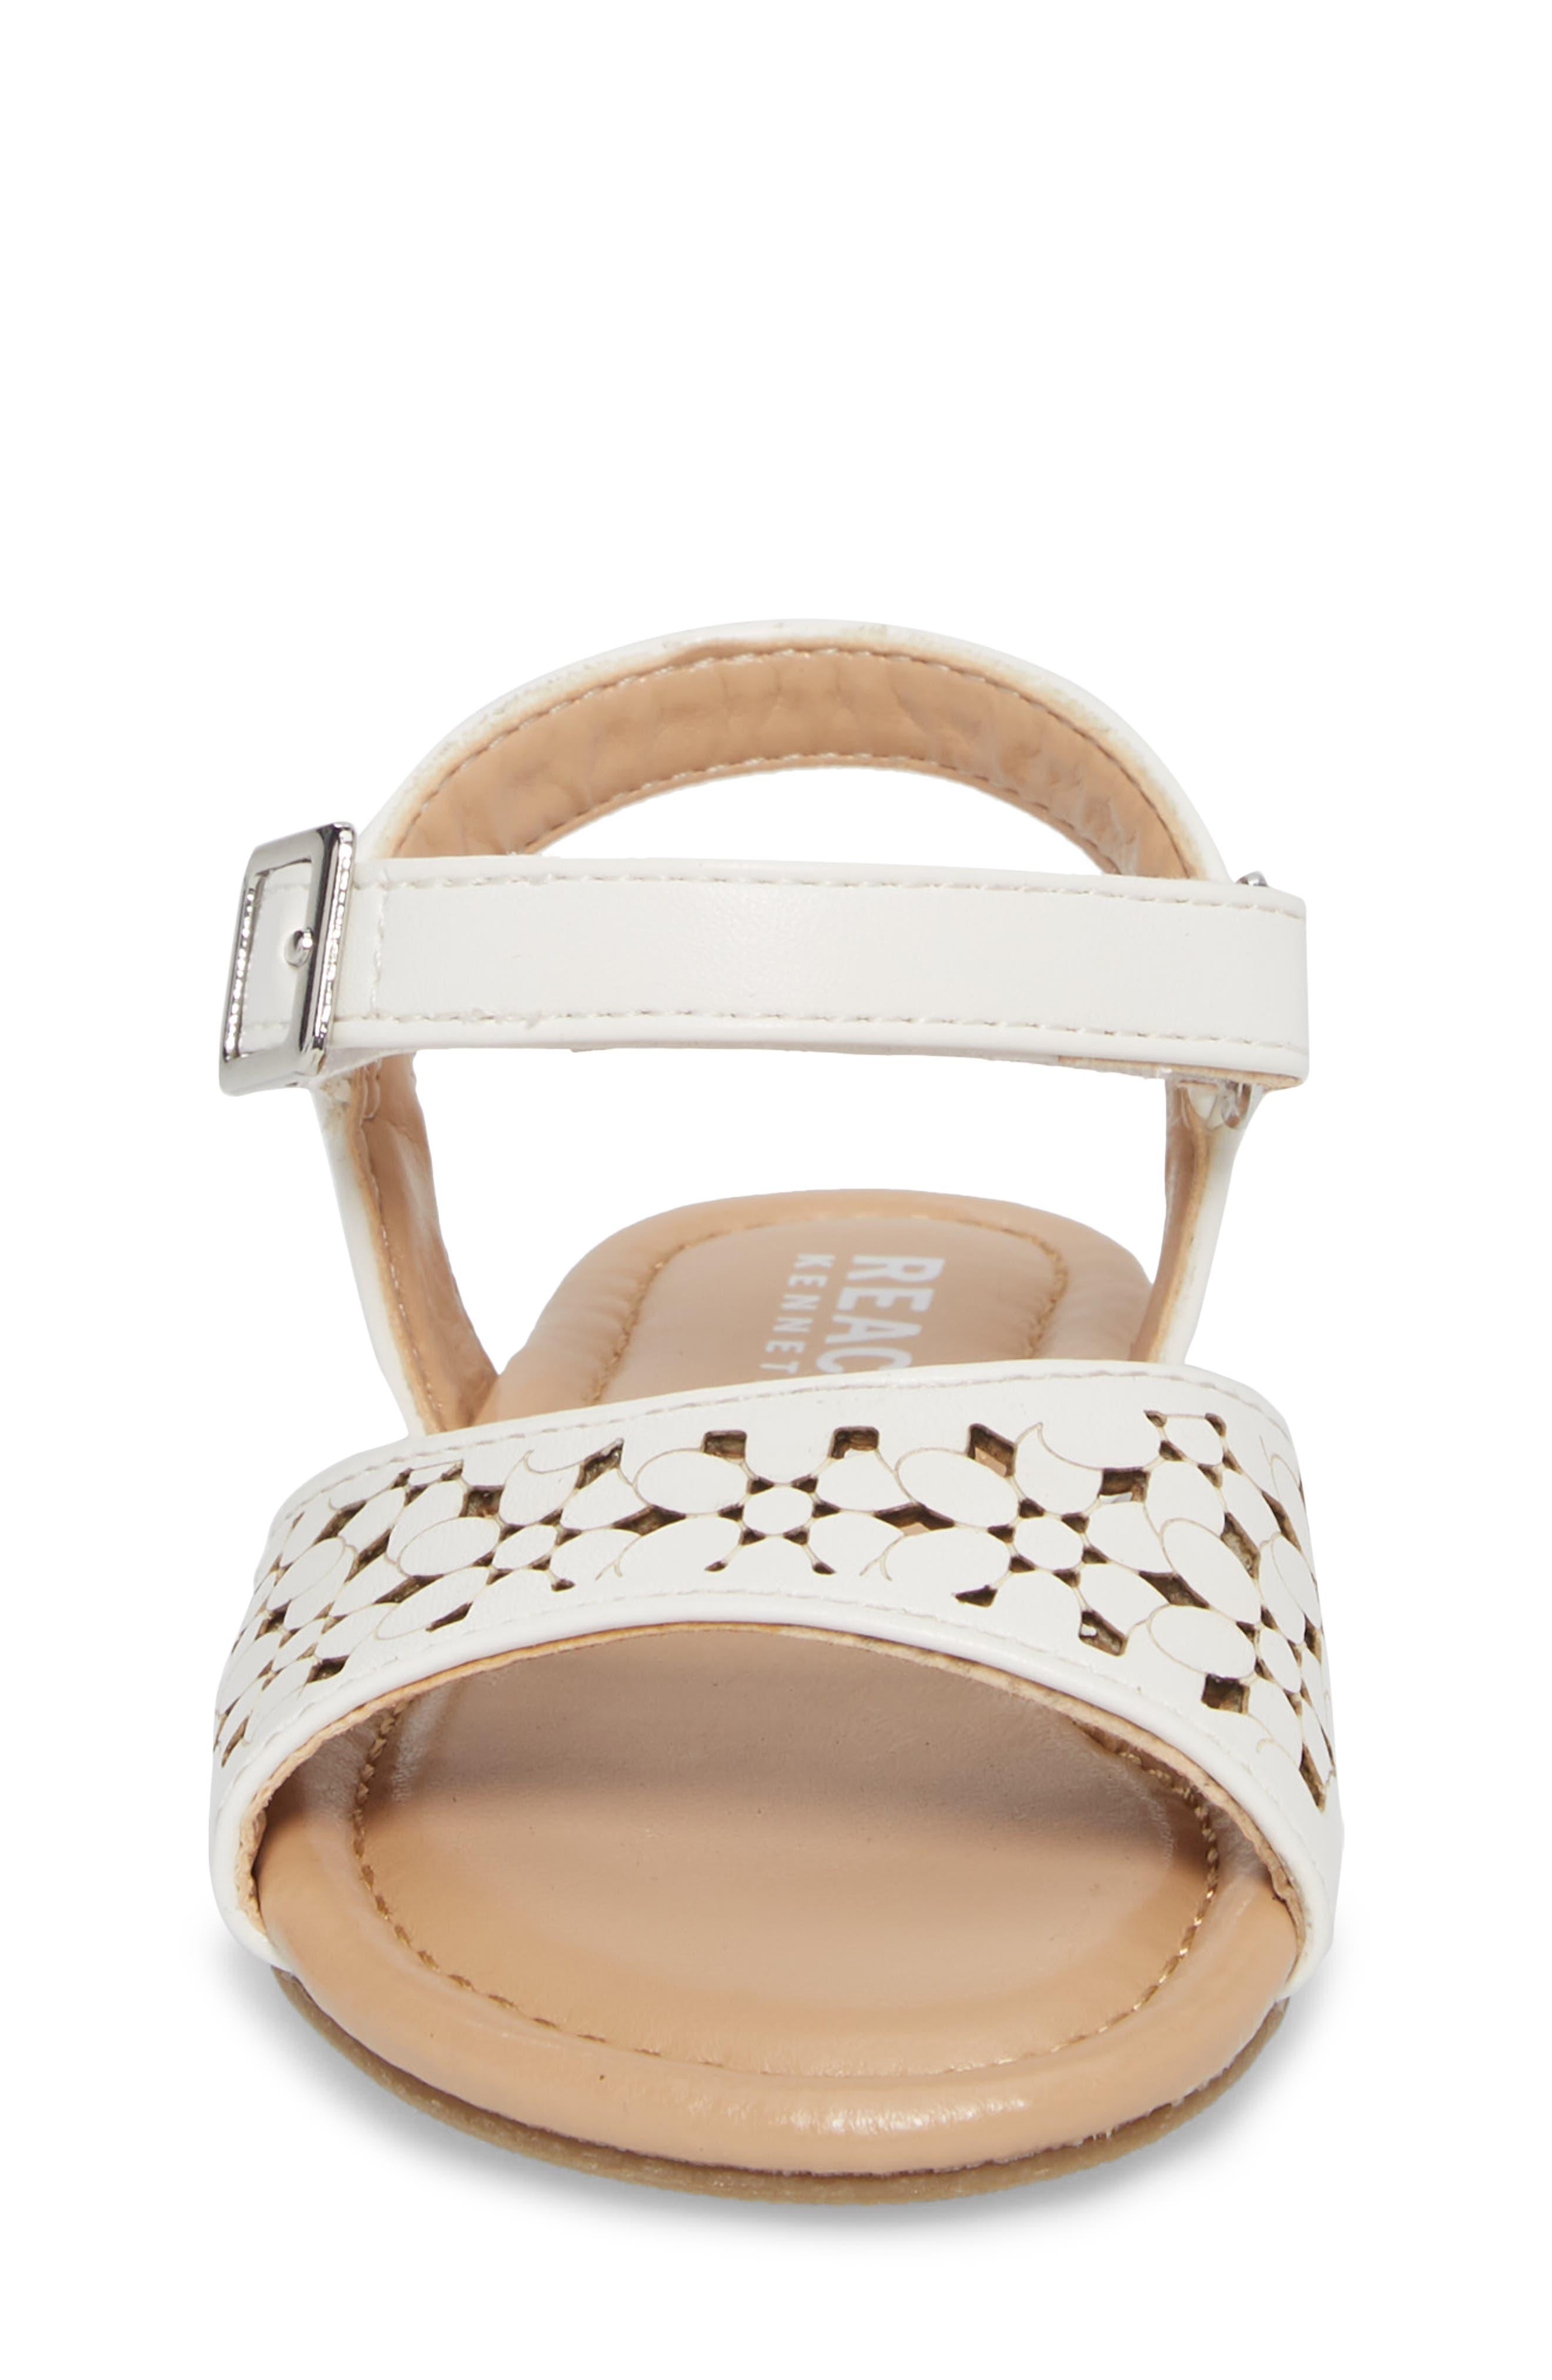 Kiera Perforated Sandal,                             Alternate thumbnail 4, color,                             100